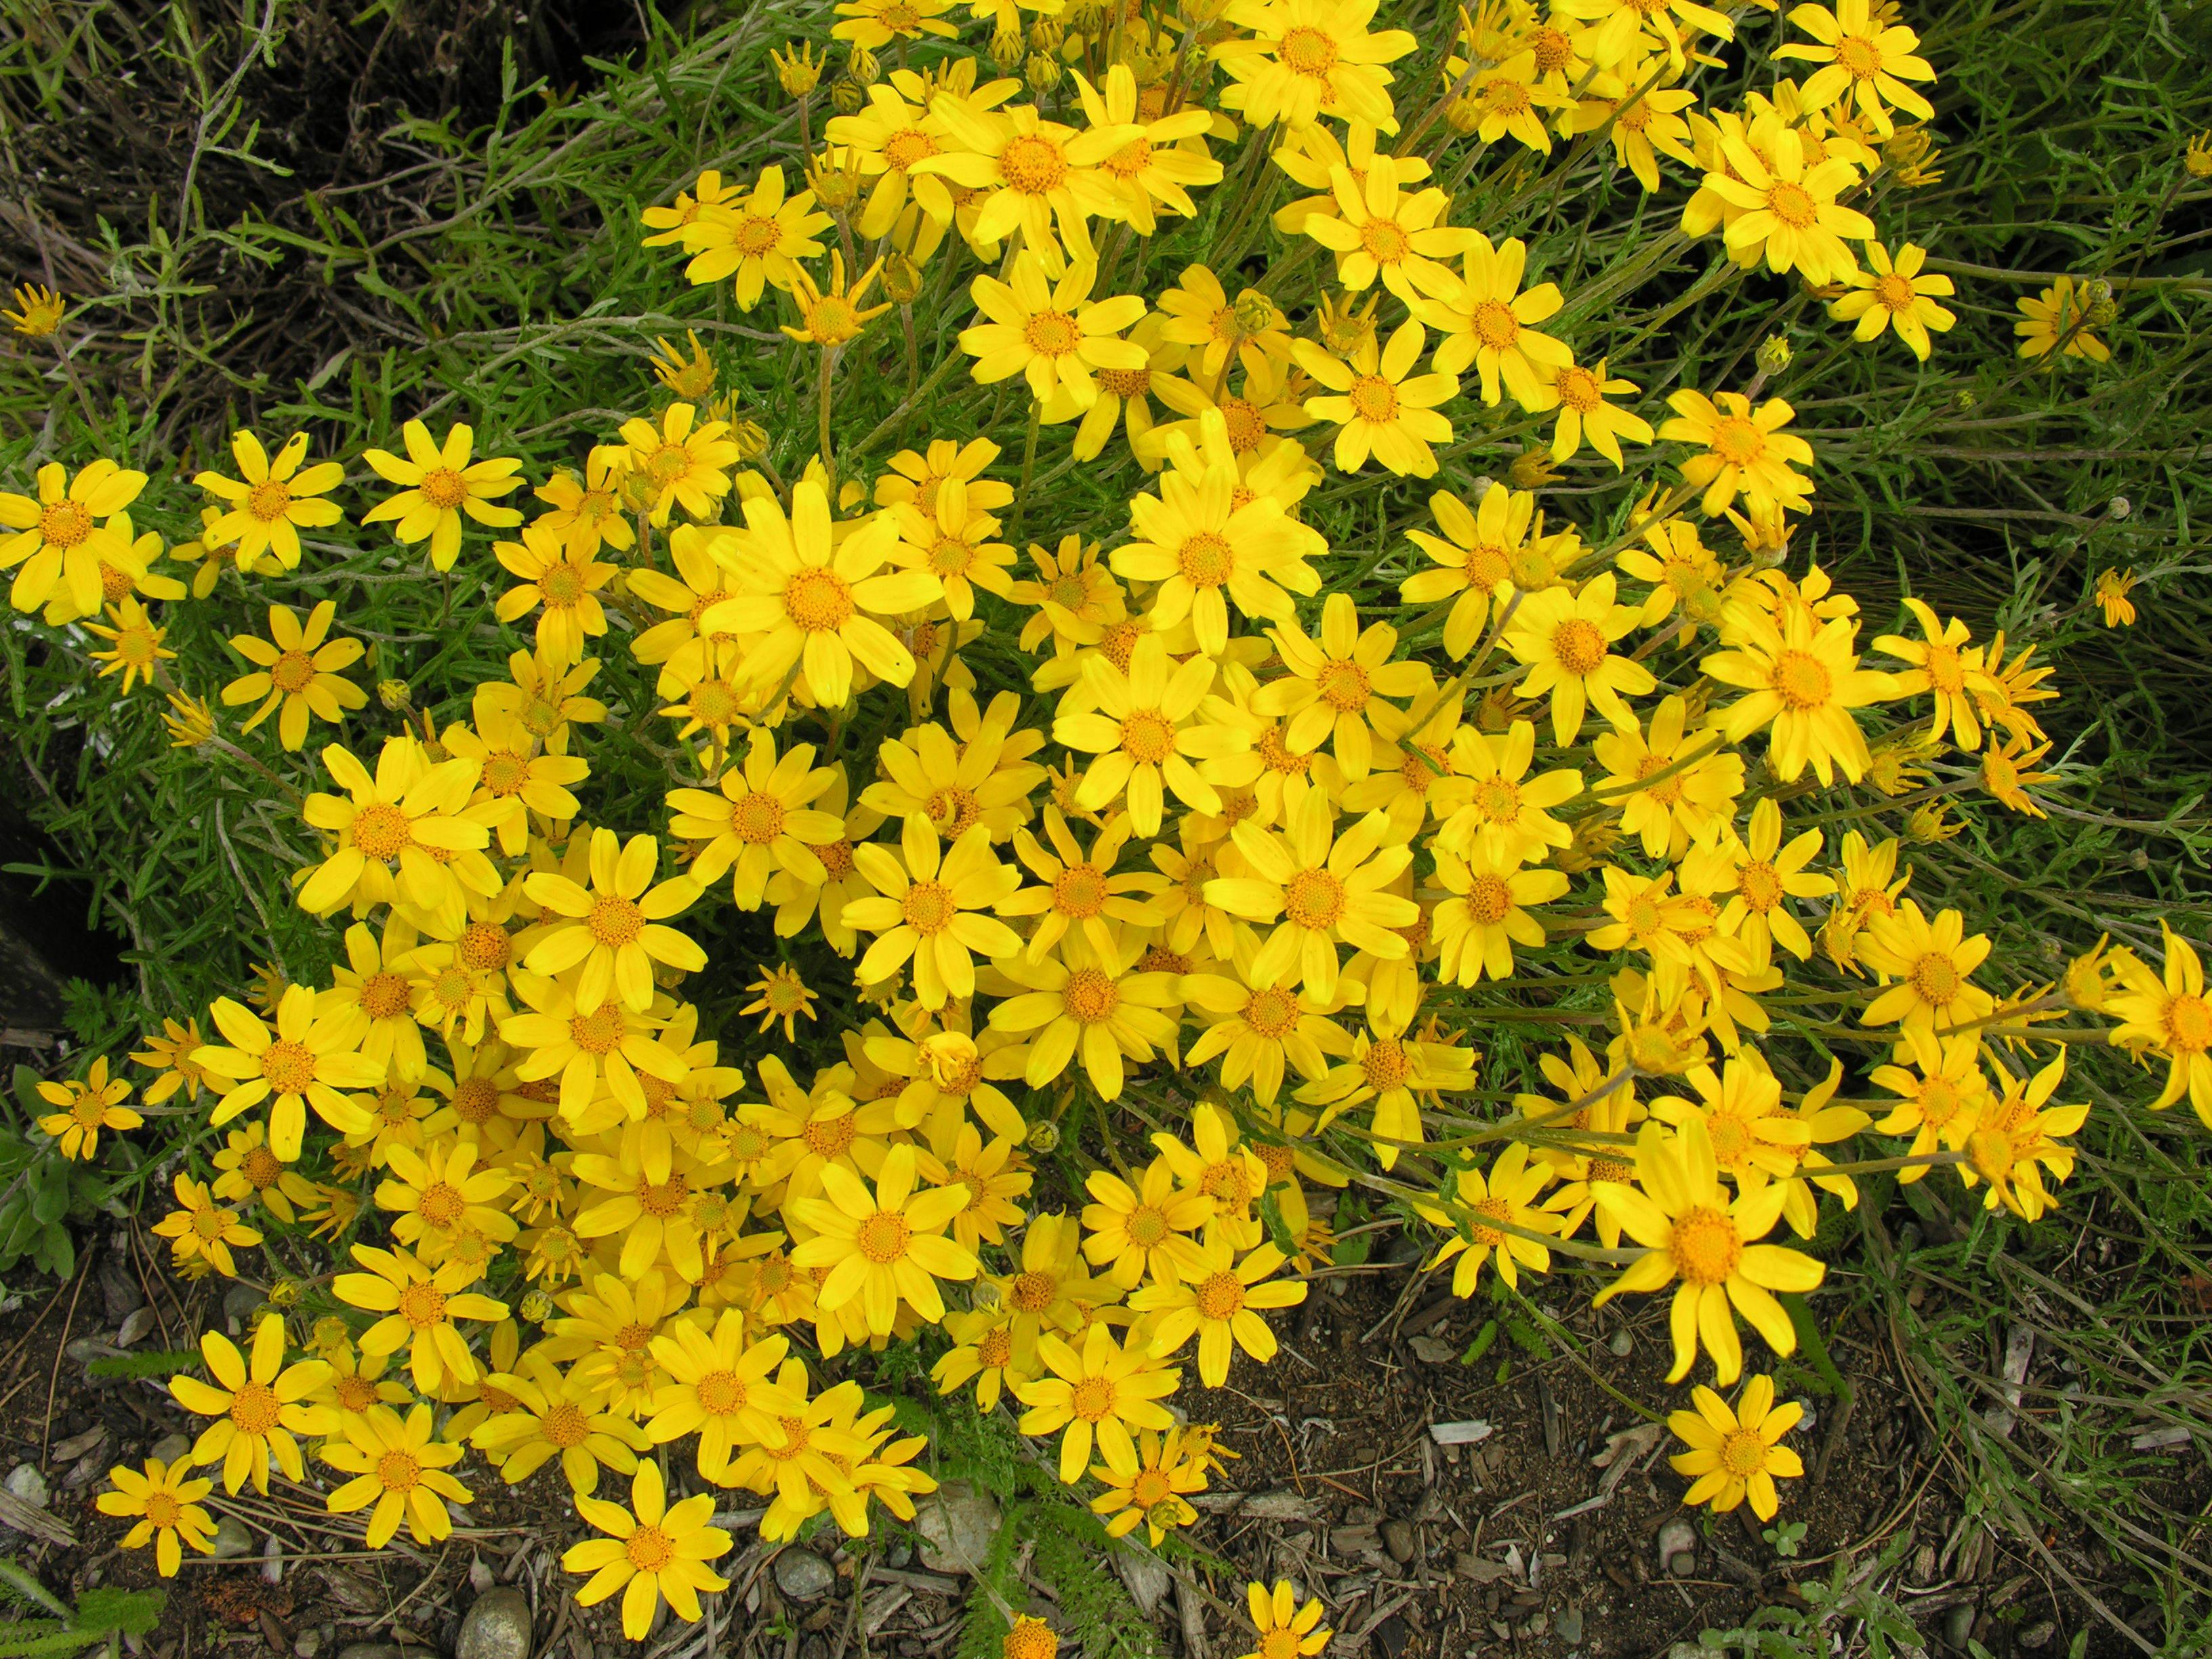 WOOLLY SUNFLOWER (Eriophyllum lanatum)